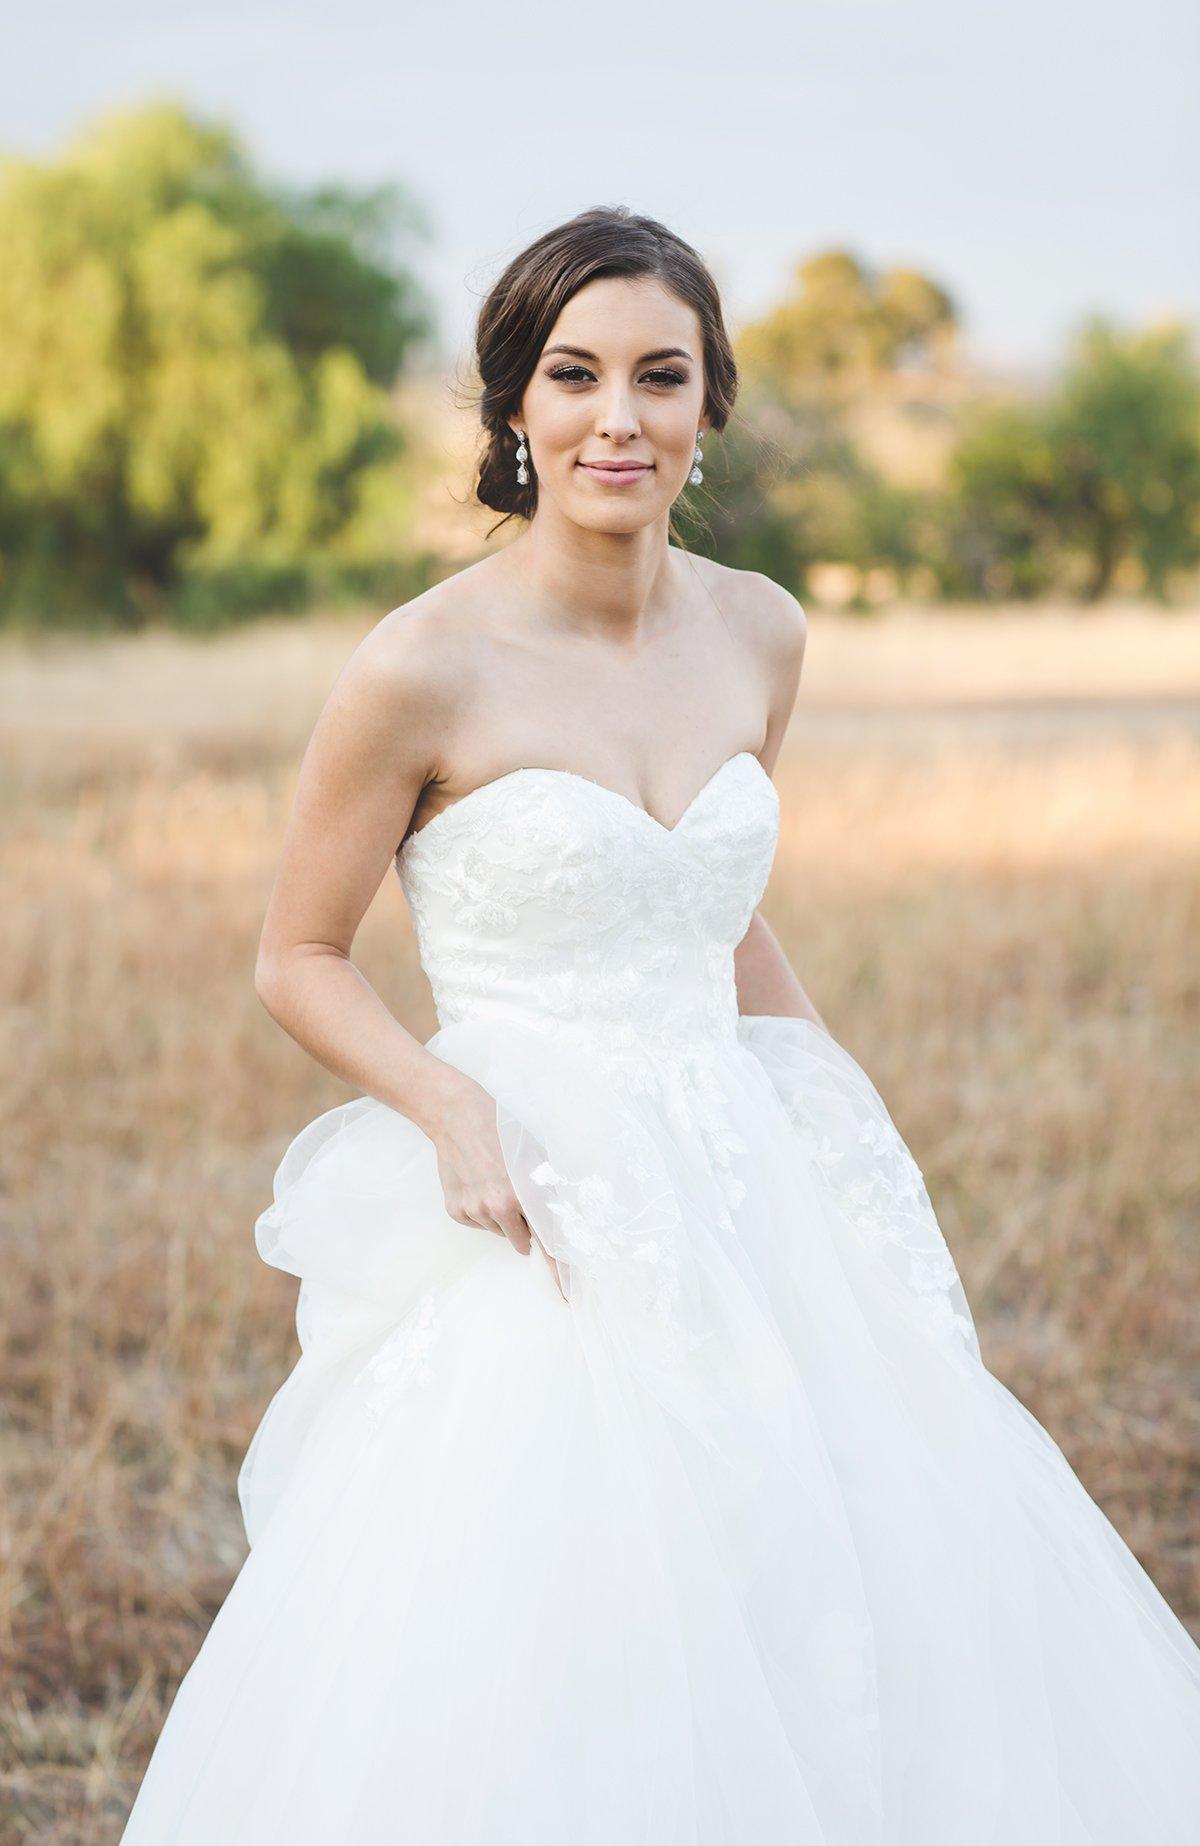 albury wedding photographer jack and jill bridal albury brides